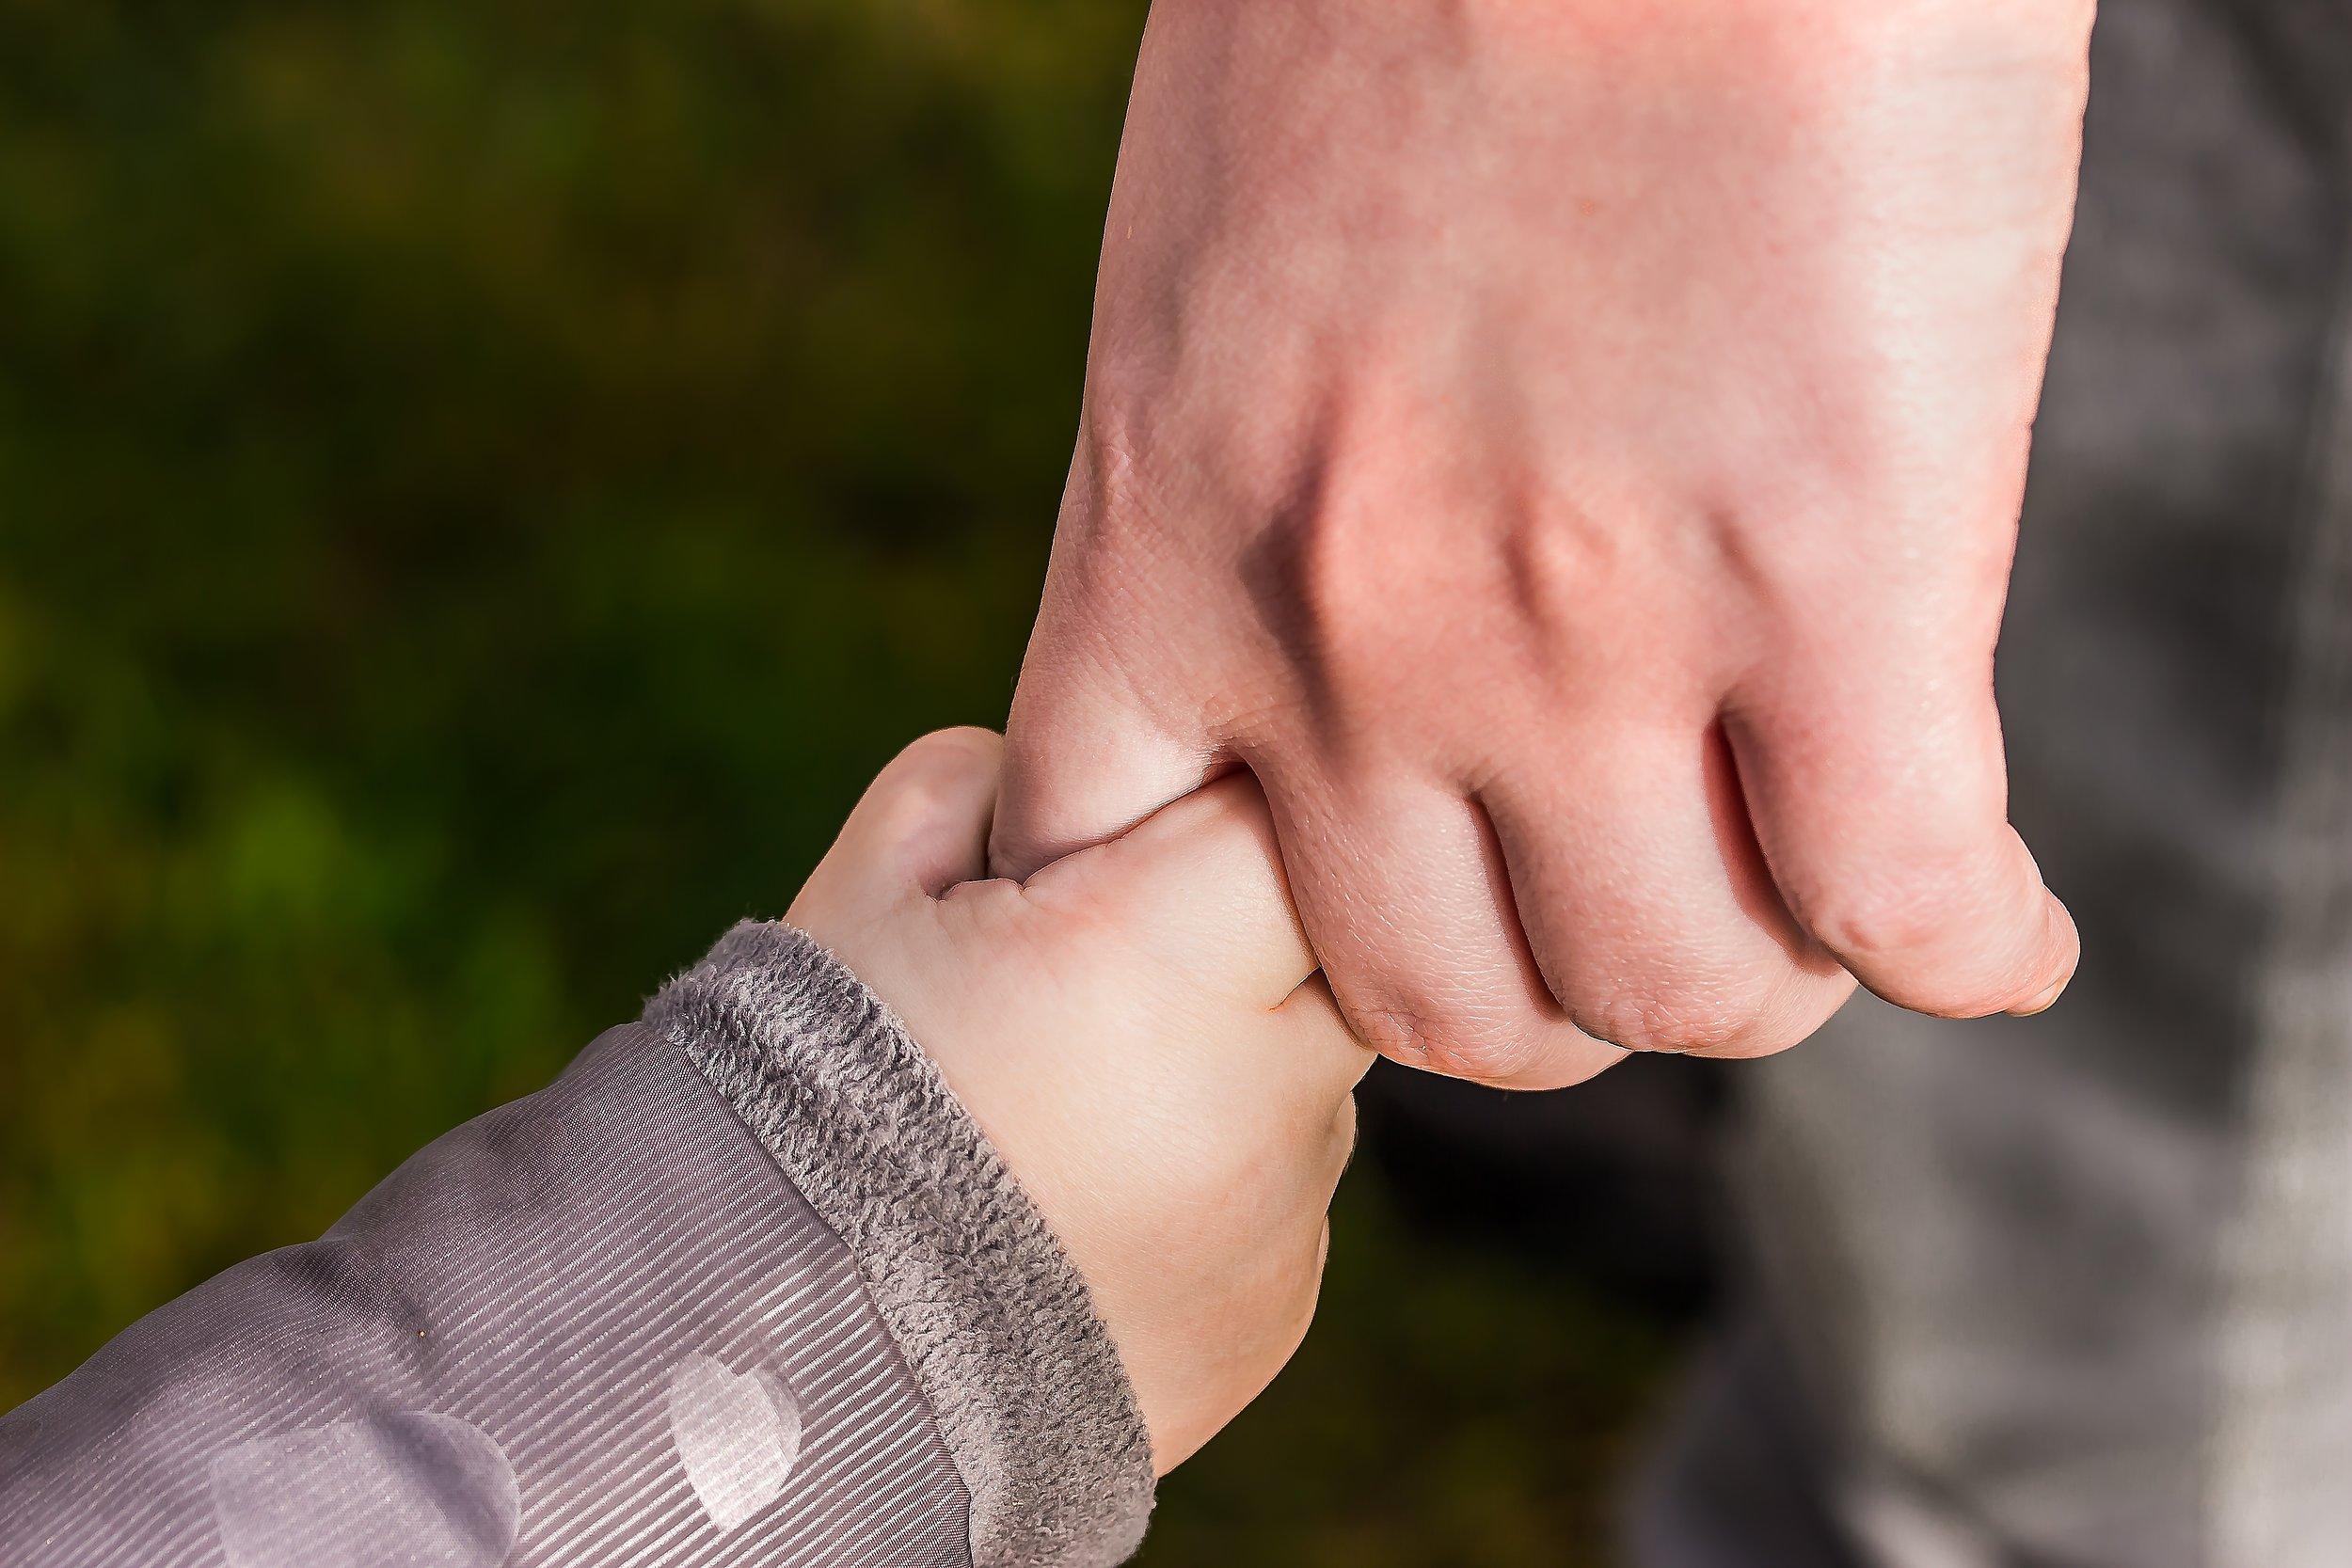 child and adult hand pexels-photo-236164.jpeg